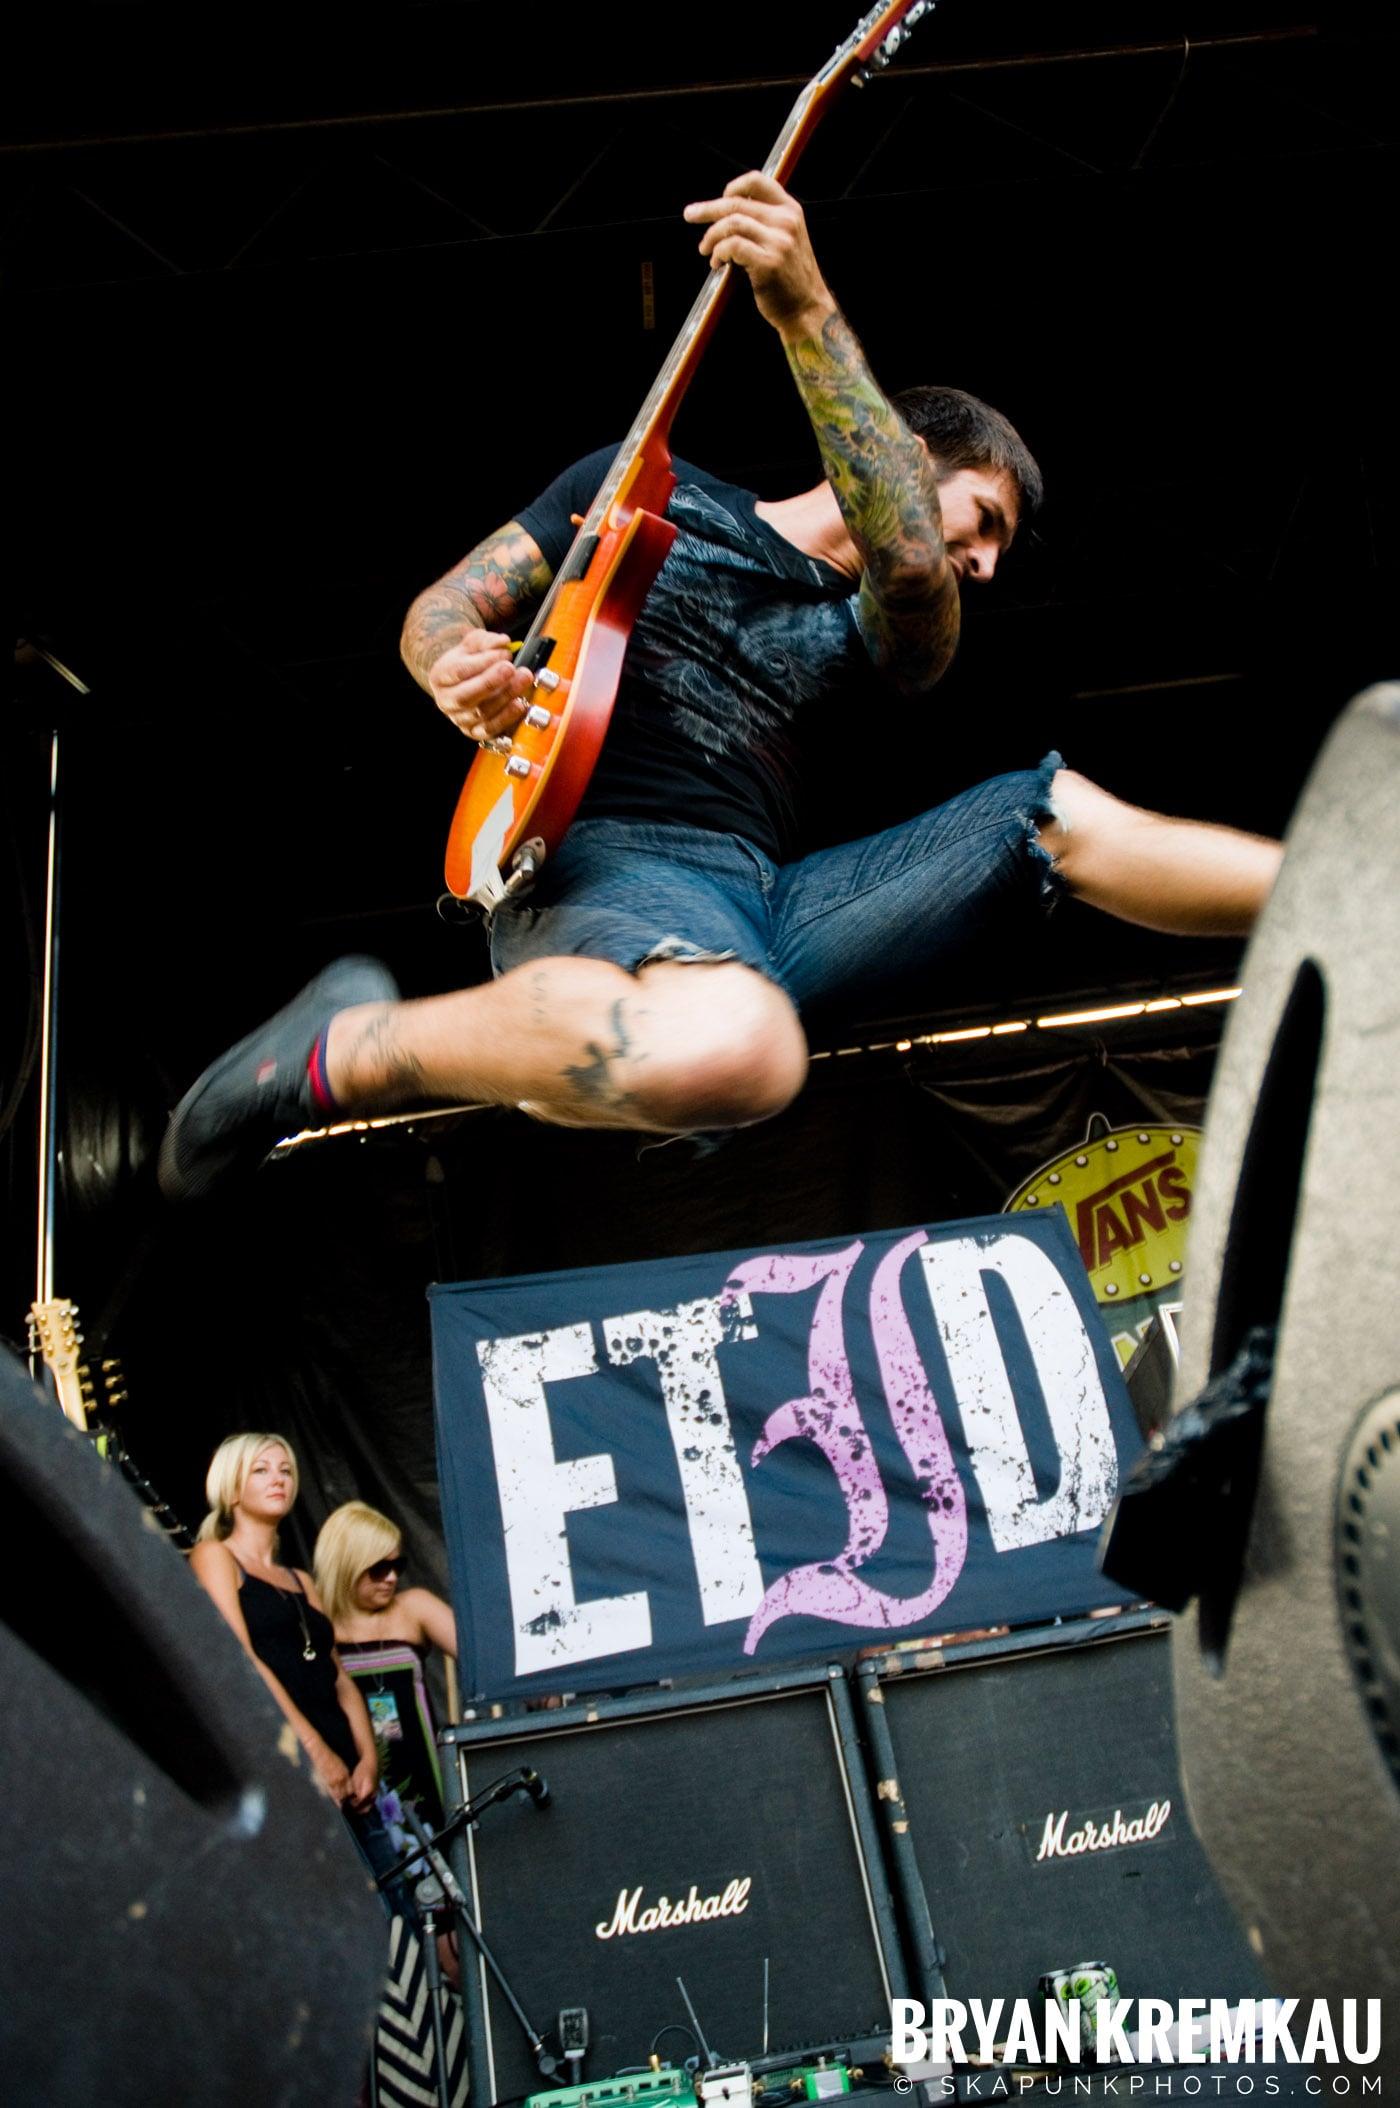 Everytime I Die @ Warped Tour 08, Scranton PA - 7.27.08 (3)